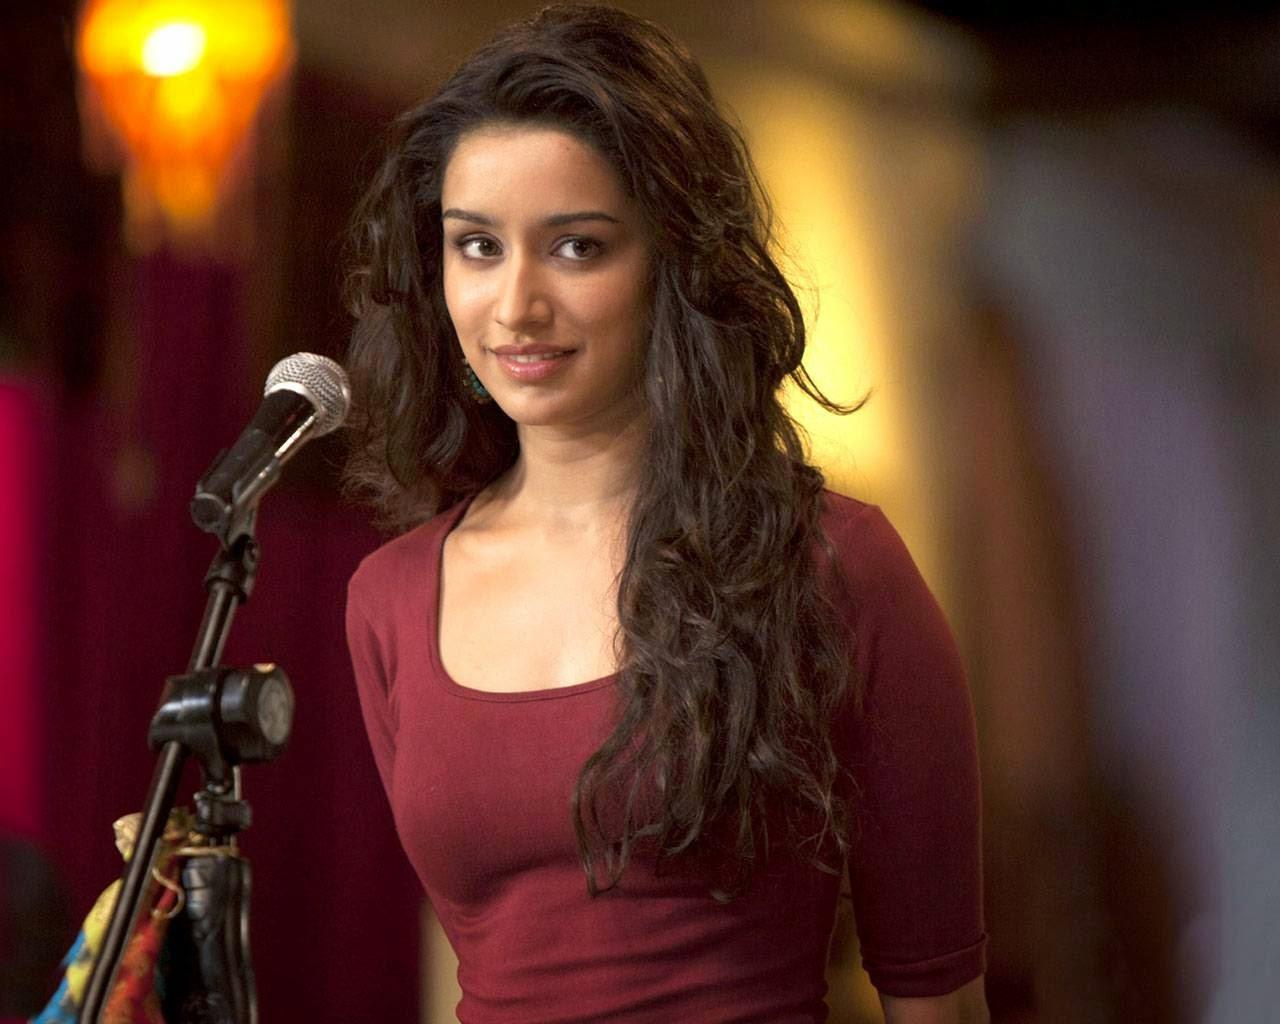 Download Shraddha Kapoor In Aashiqui 2 Movie Hd Wallpaper: Aashiqui 2 Shraddha Kapoor Unseen HD Images